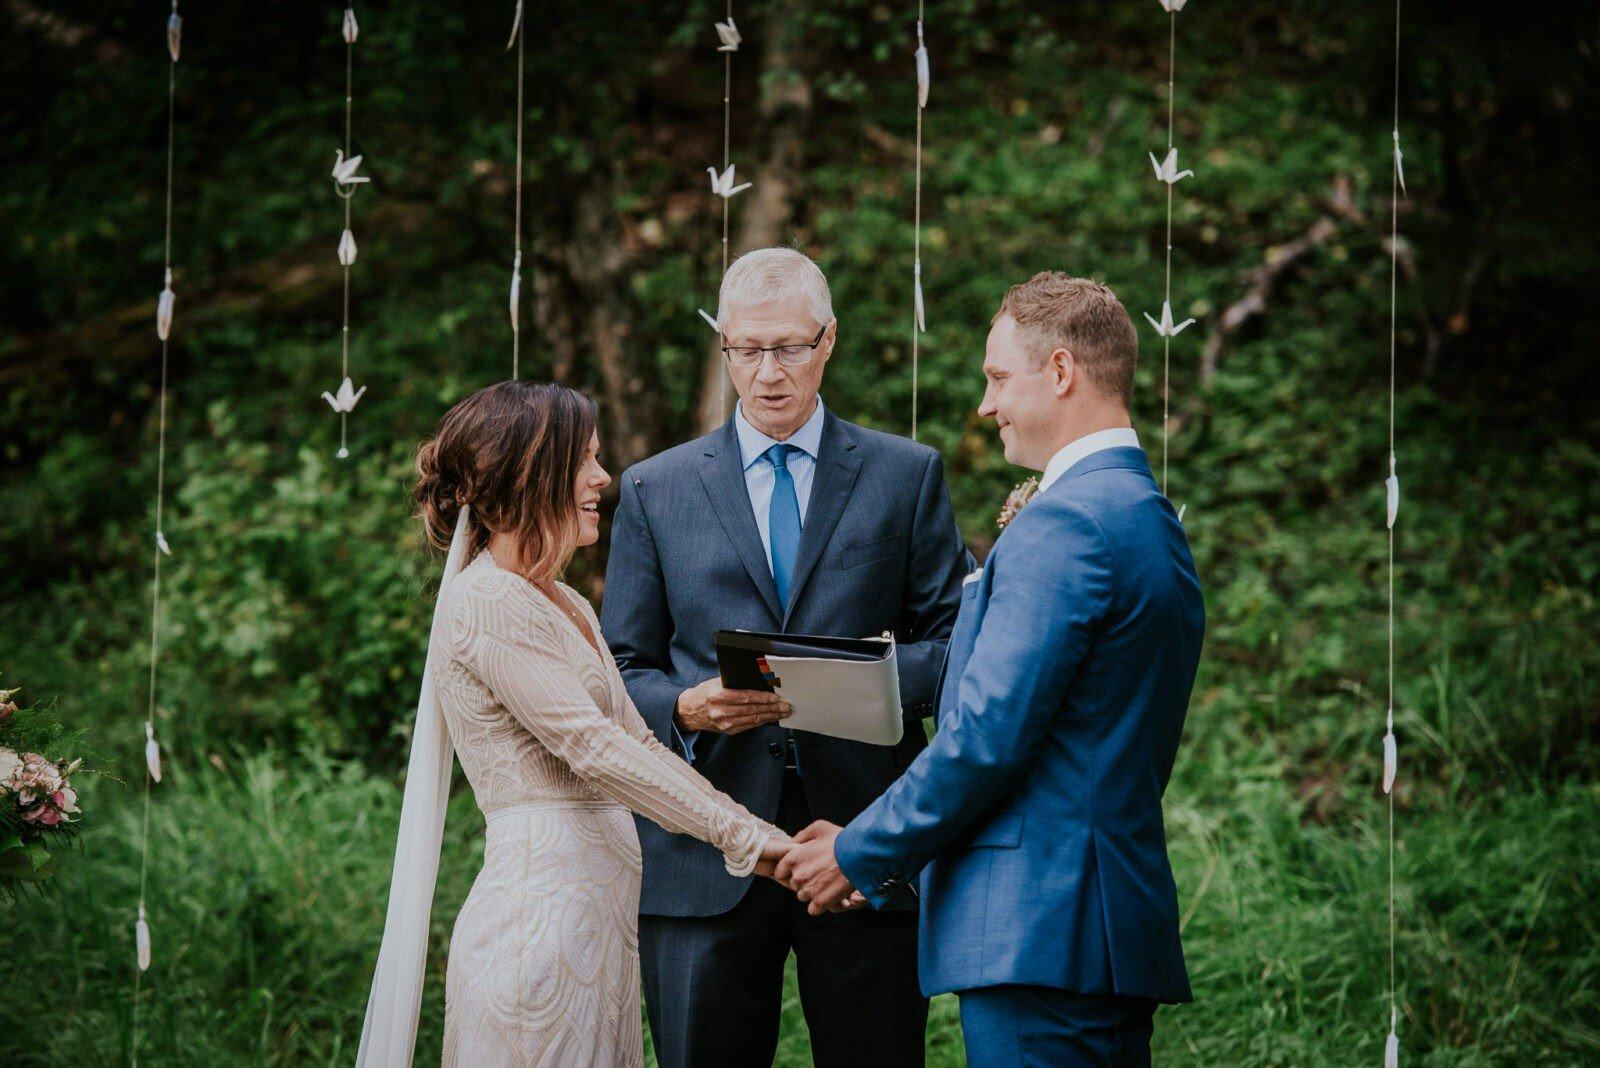 Woodland wedding ceremony.